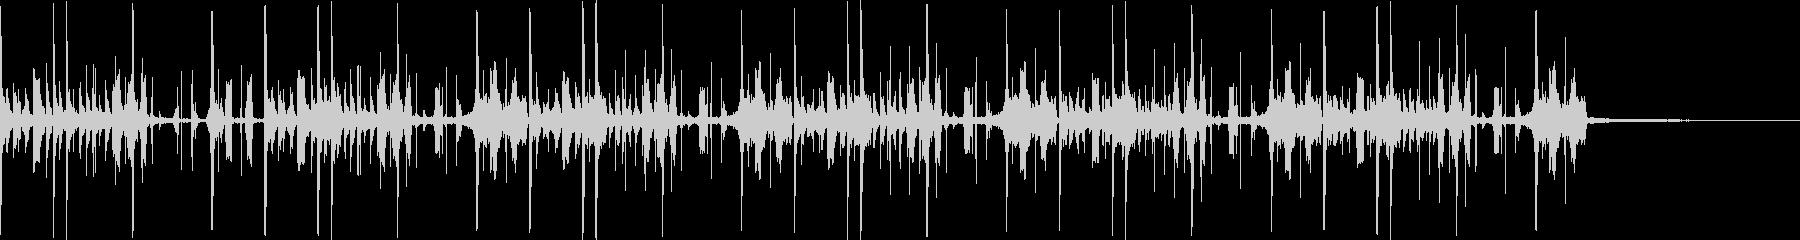 EDM オーガニックで楽しい曲ですの未再生の波形